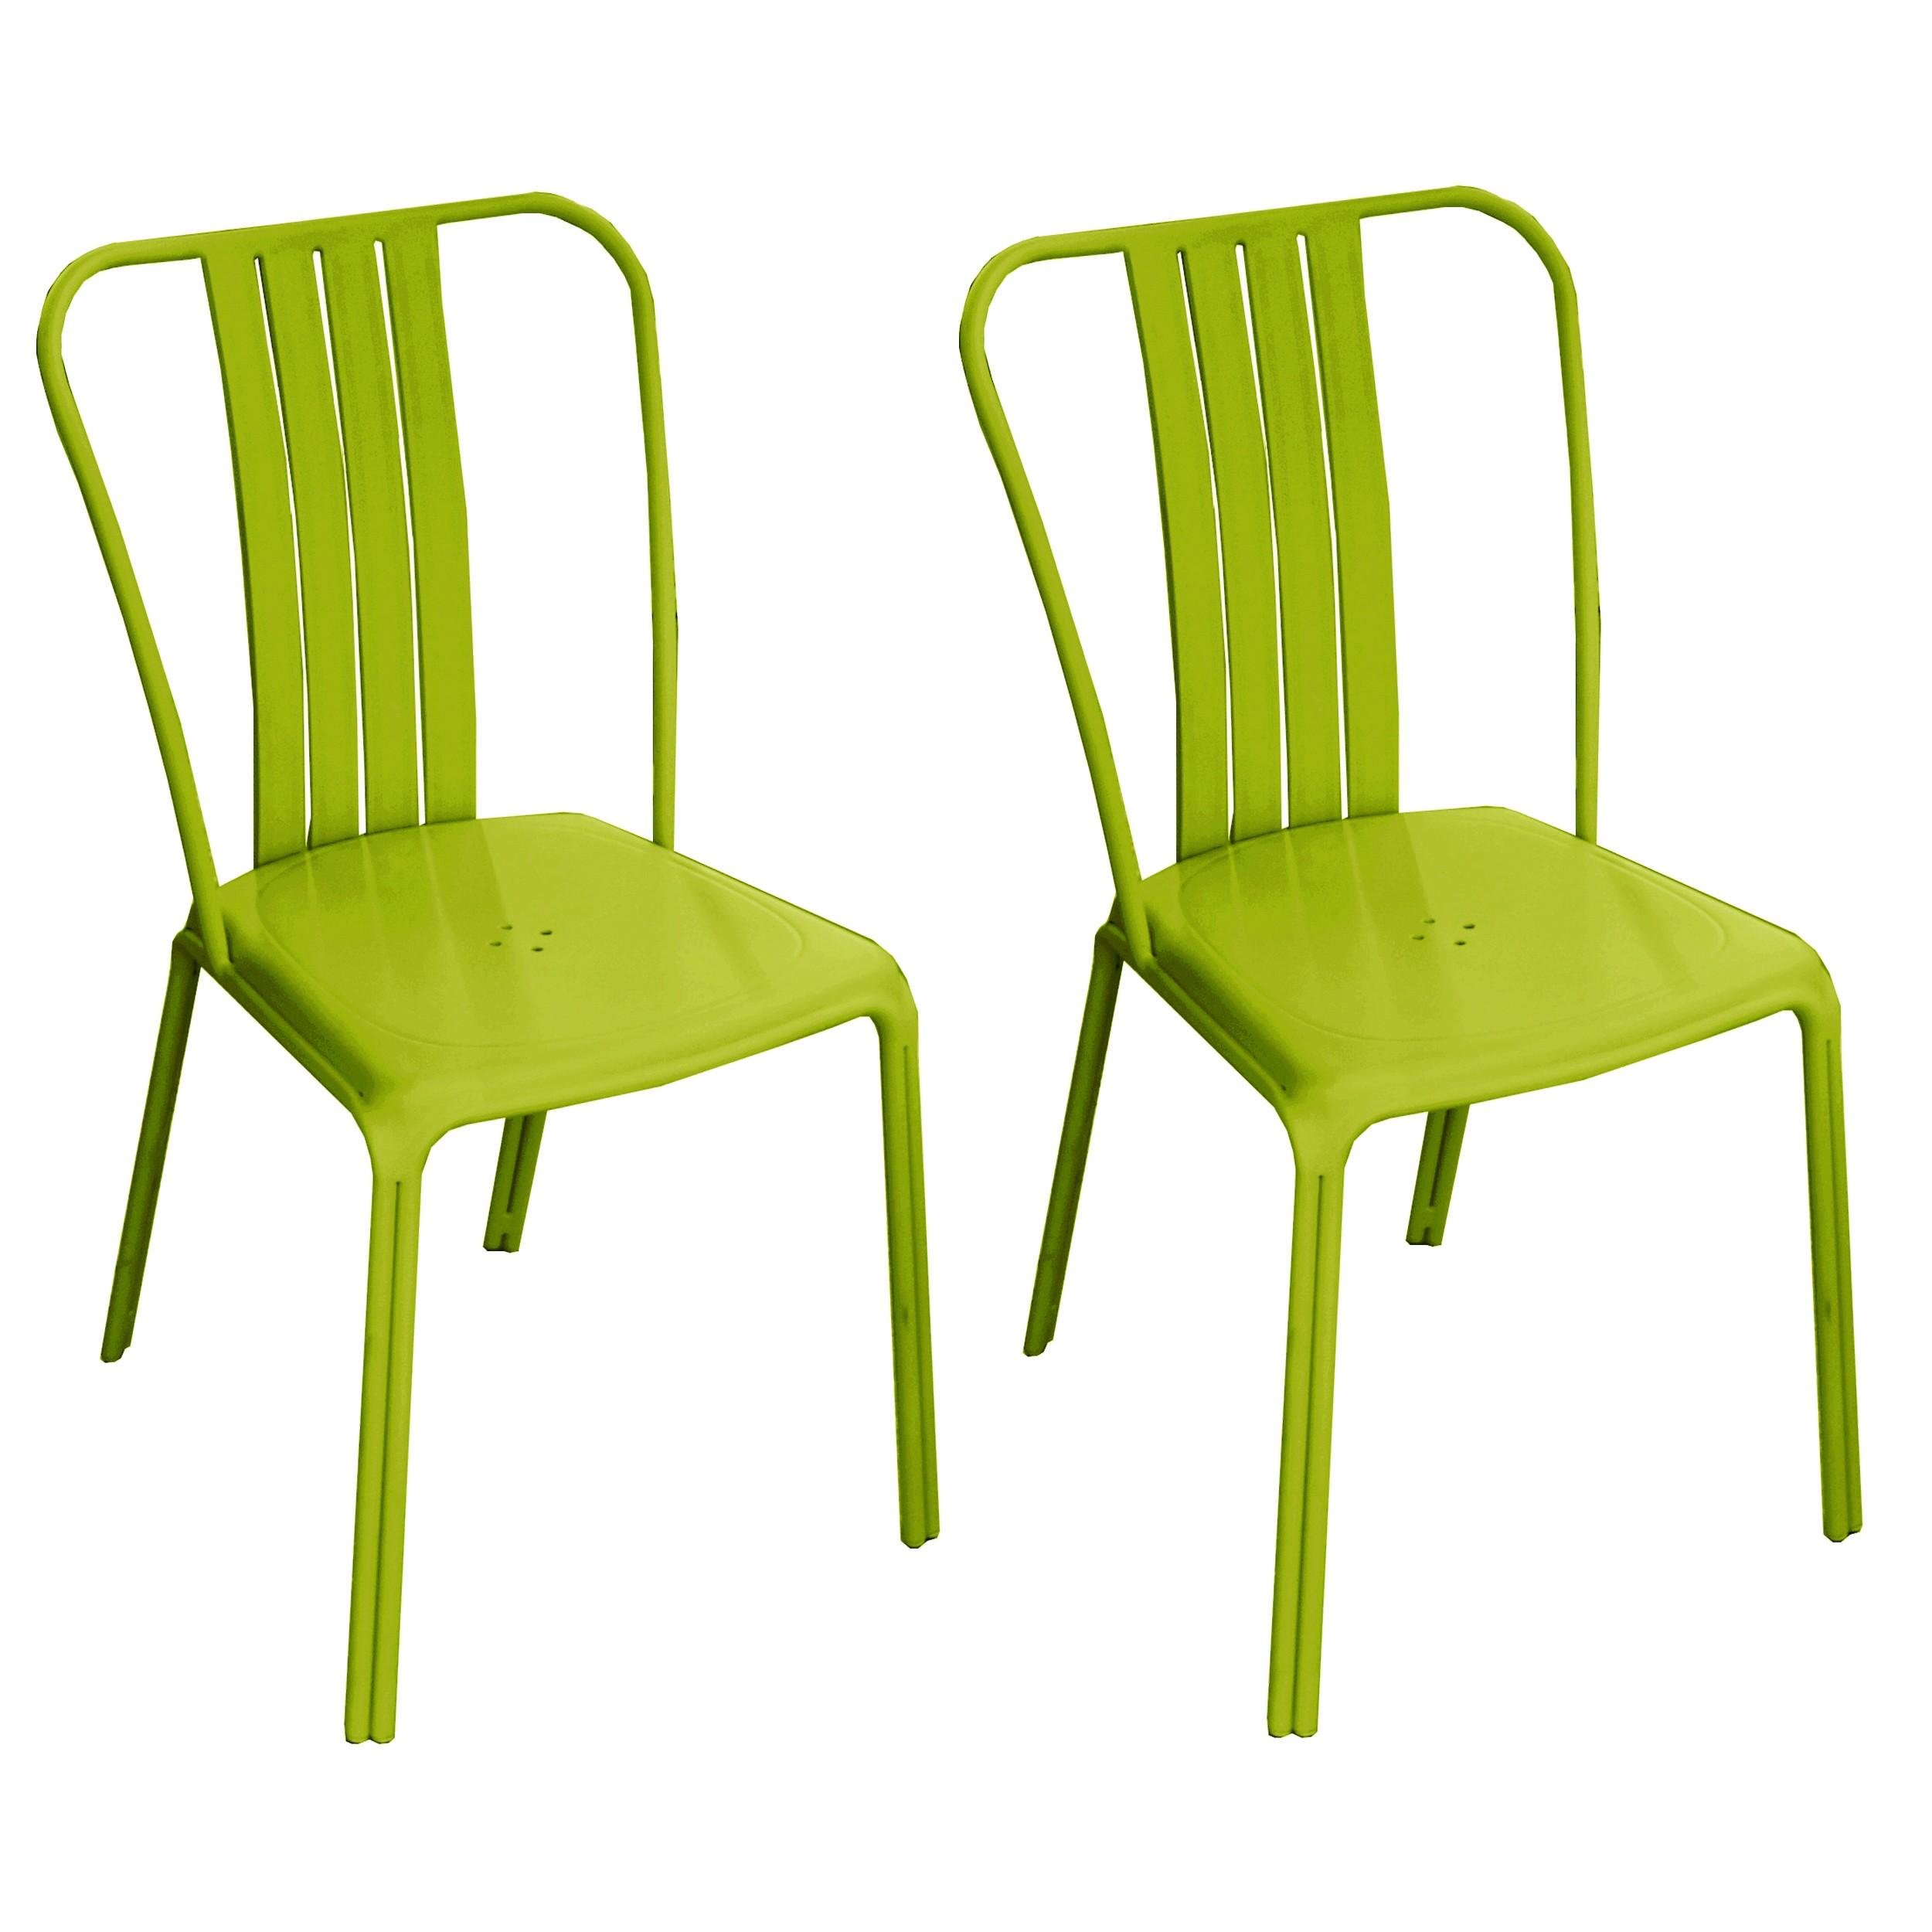 acheter chaise exterieure verte moderne prix bas